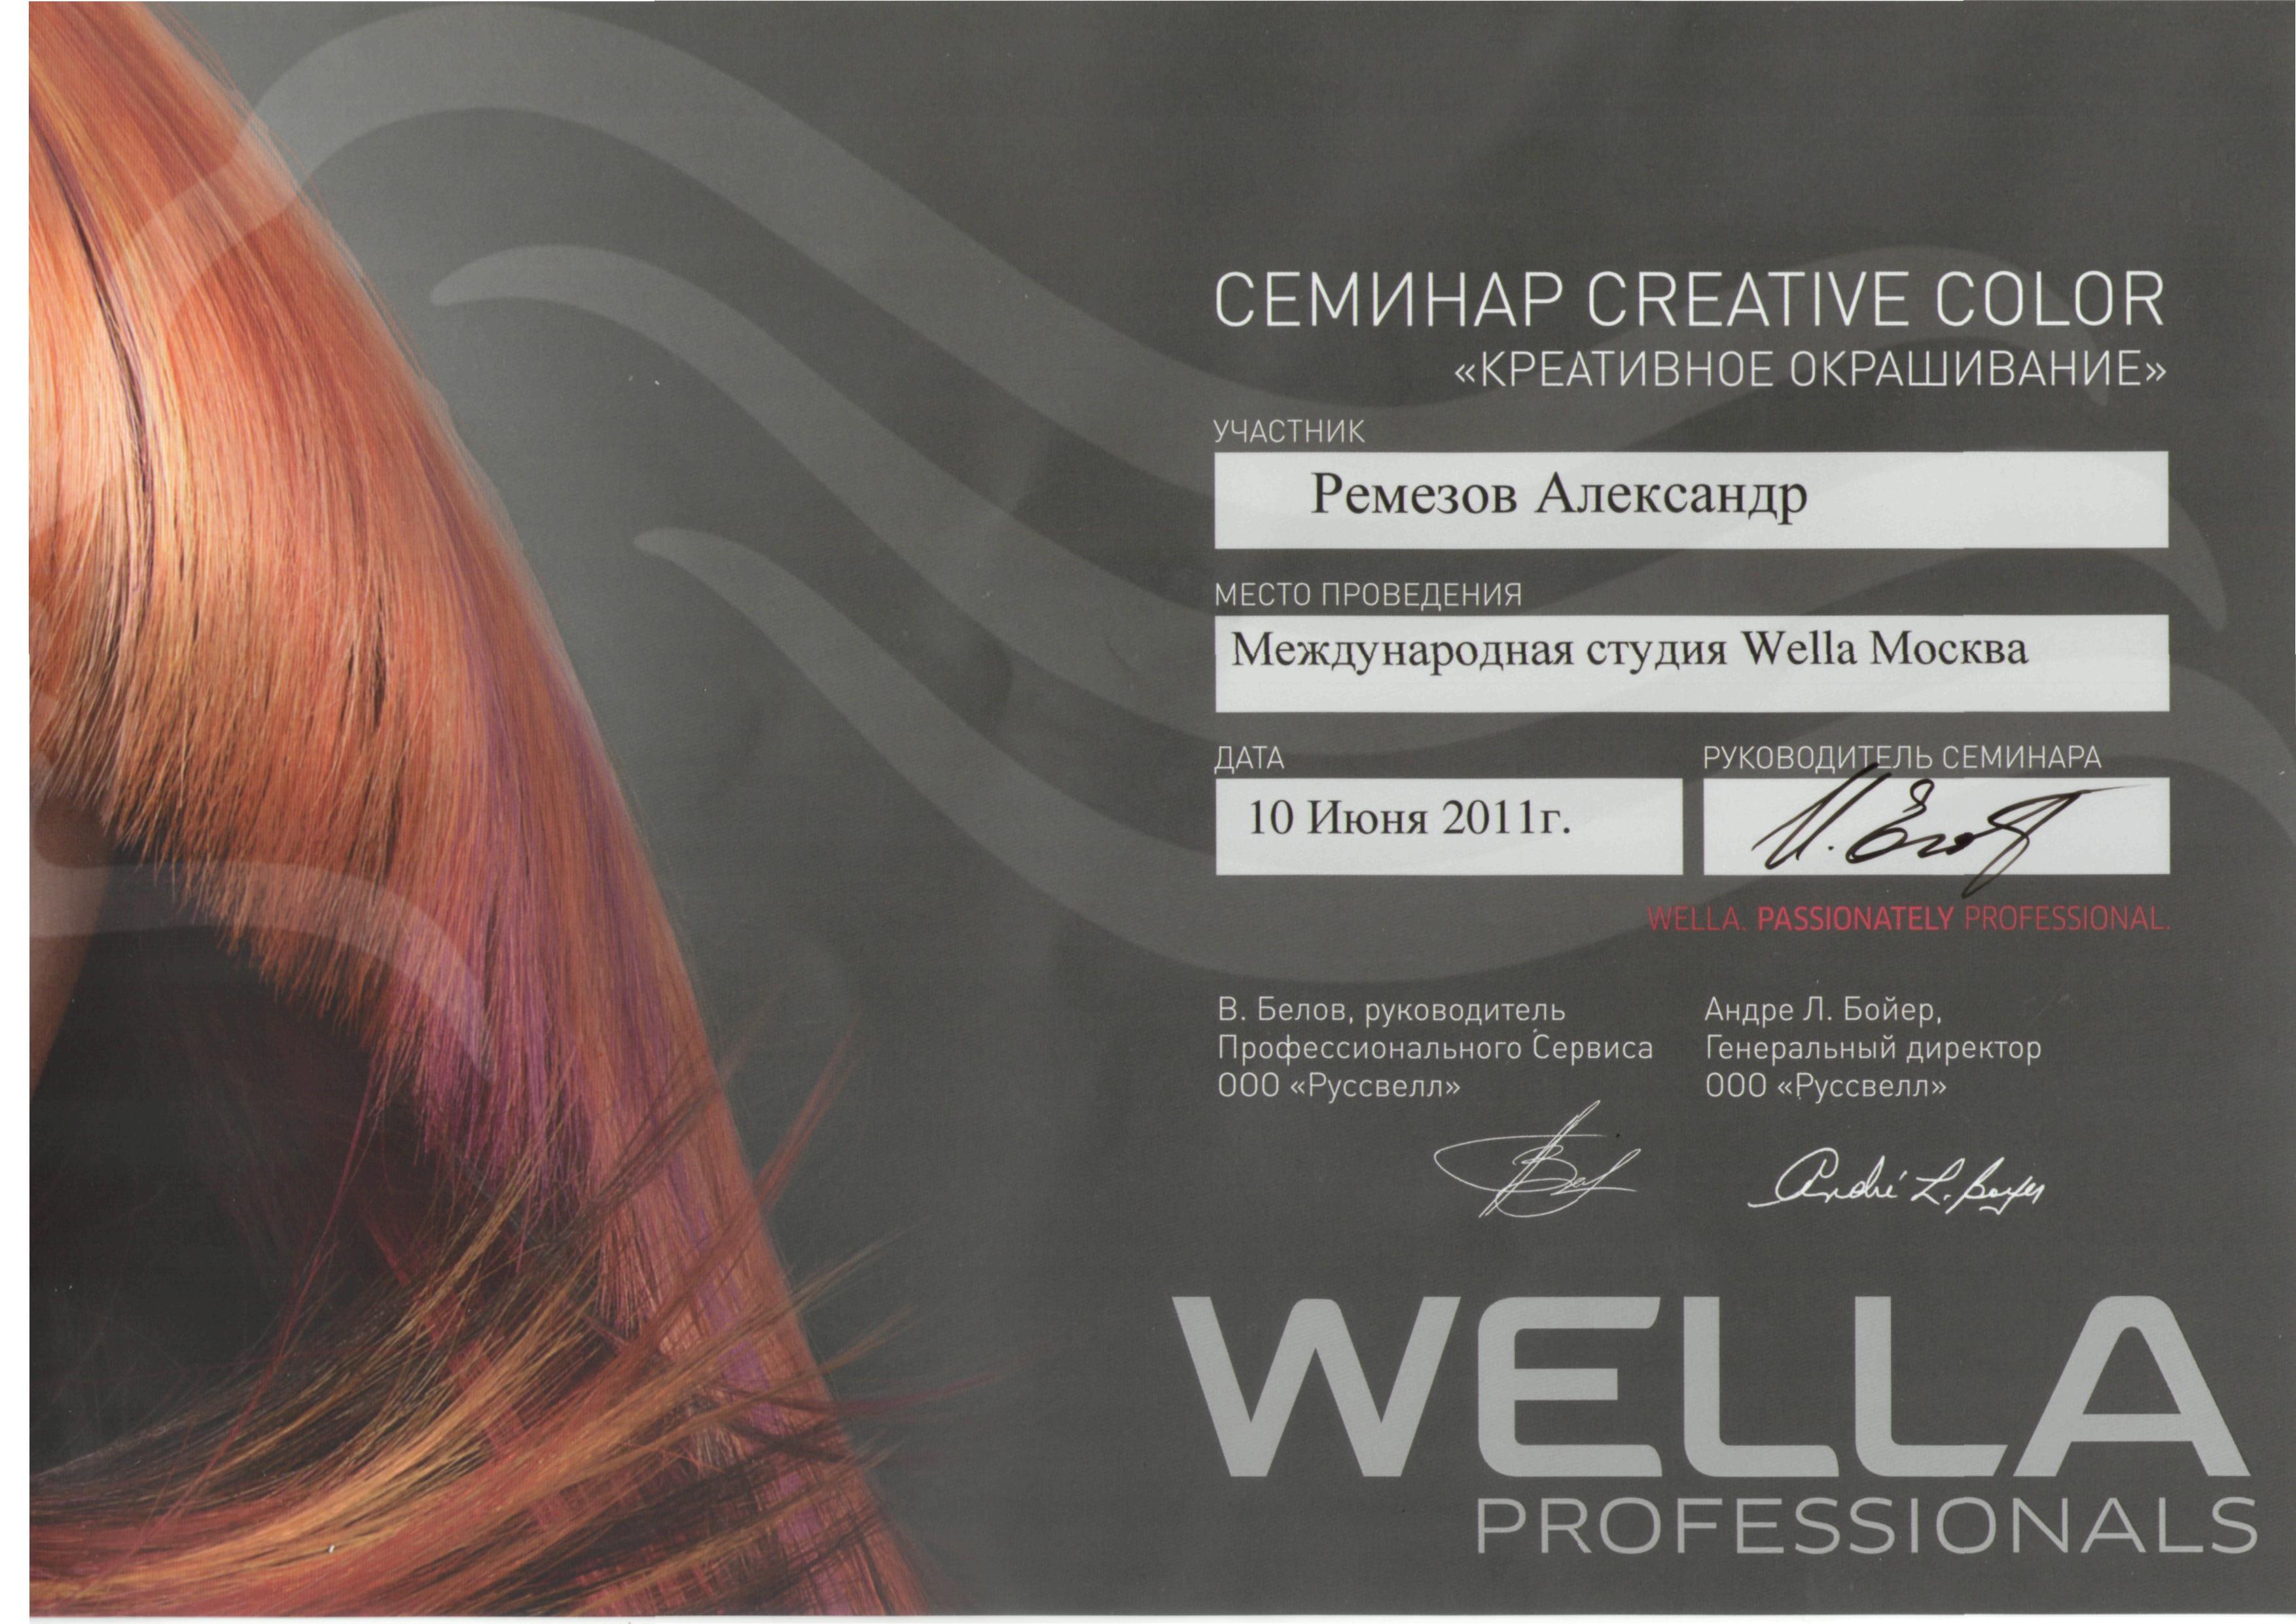 2011 креативное окрашивание wella